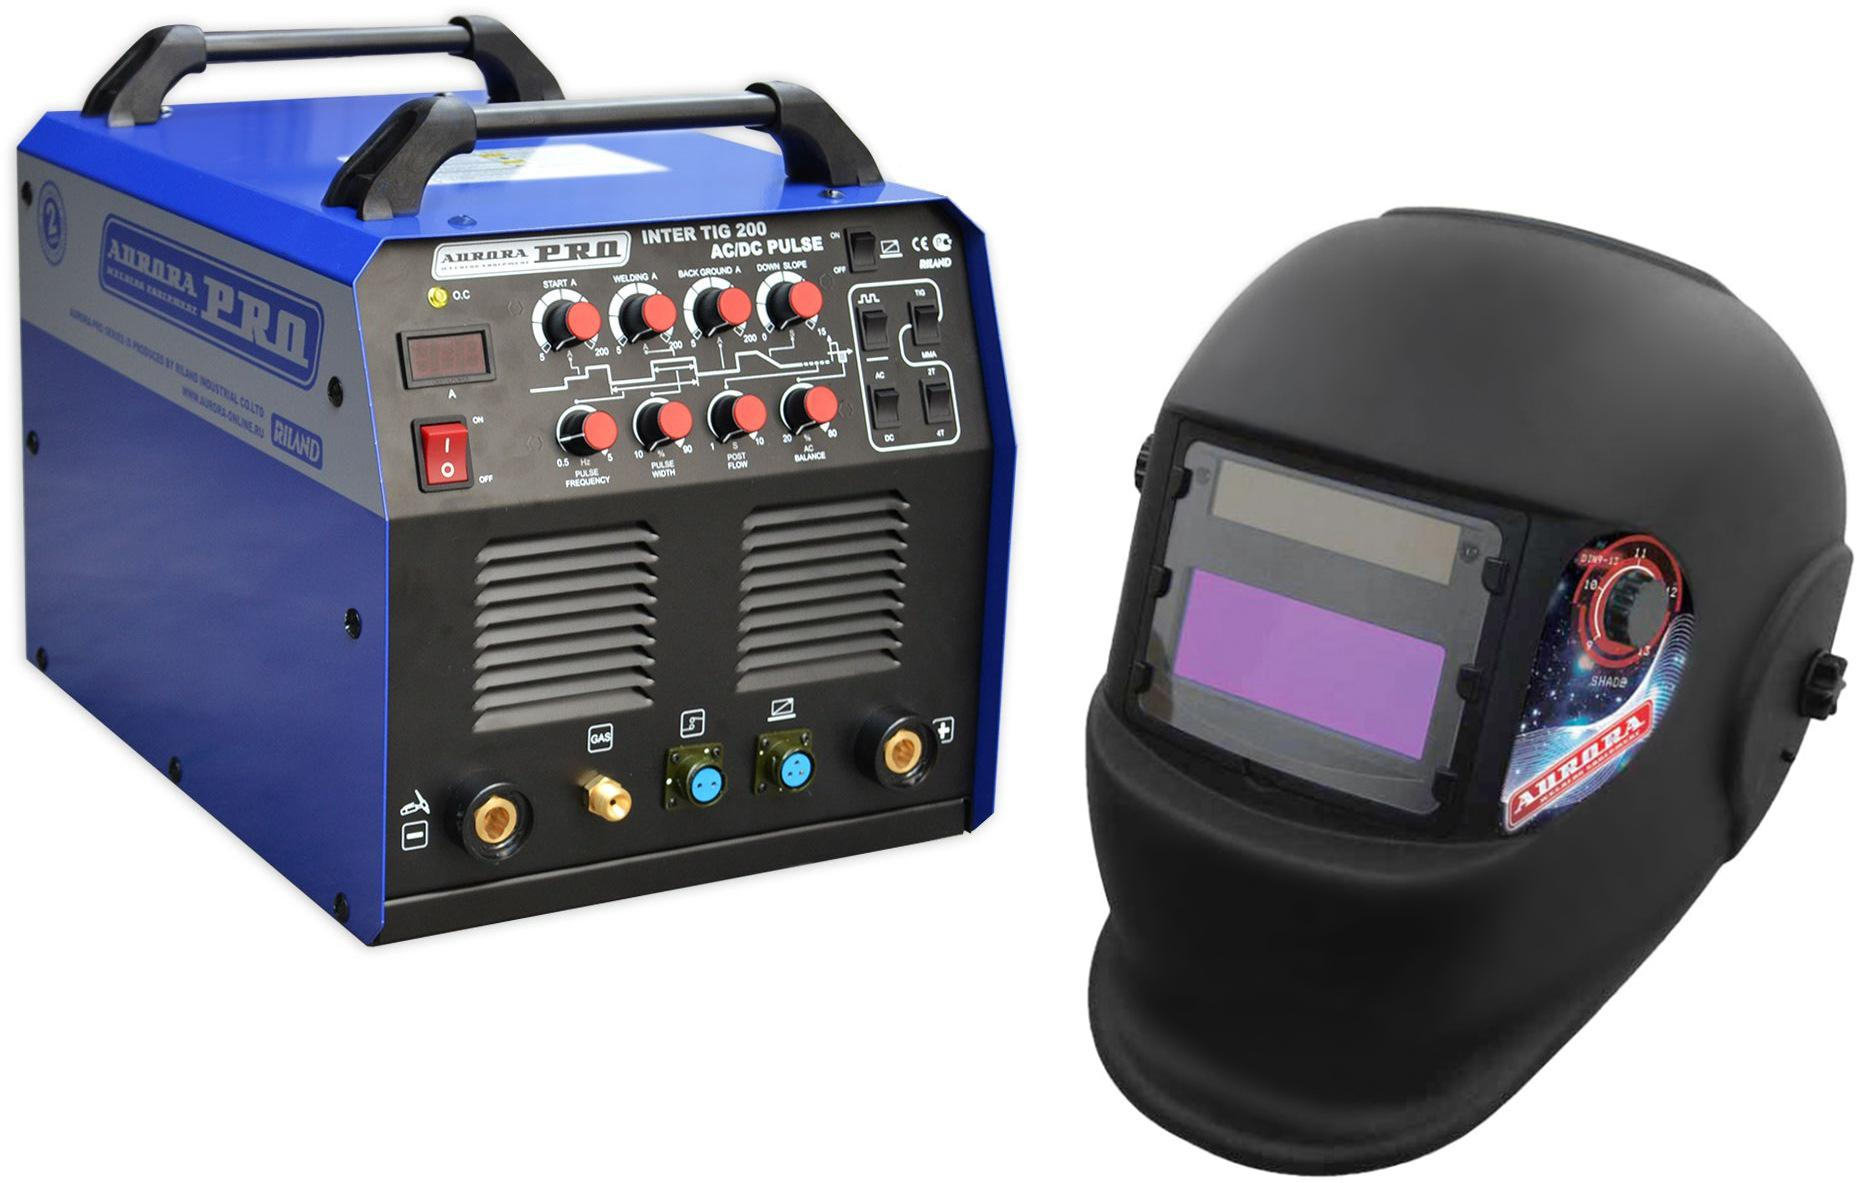 цена на Набор Aurora pro Сварочный аппарат inter tig 200 ac/dc pulse mosfet +Маска a998f(9-13din) black cosmo